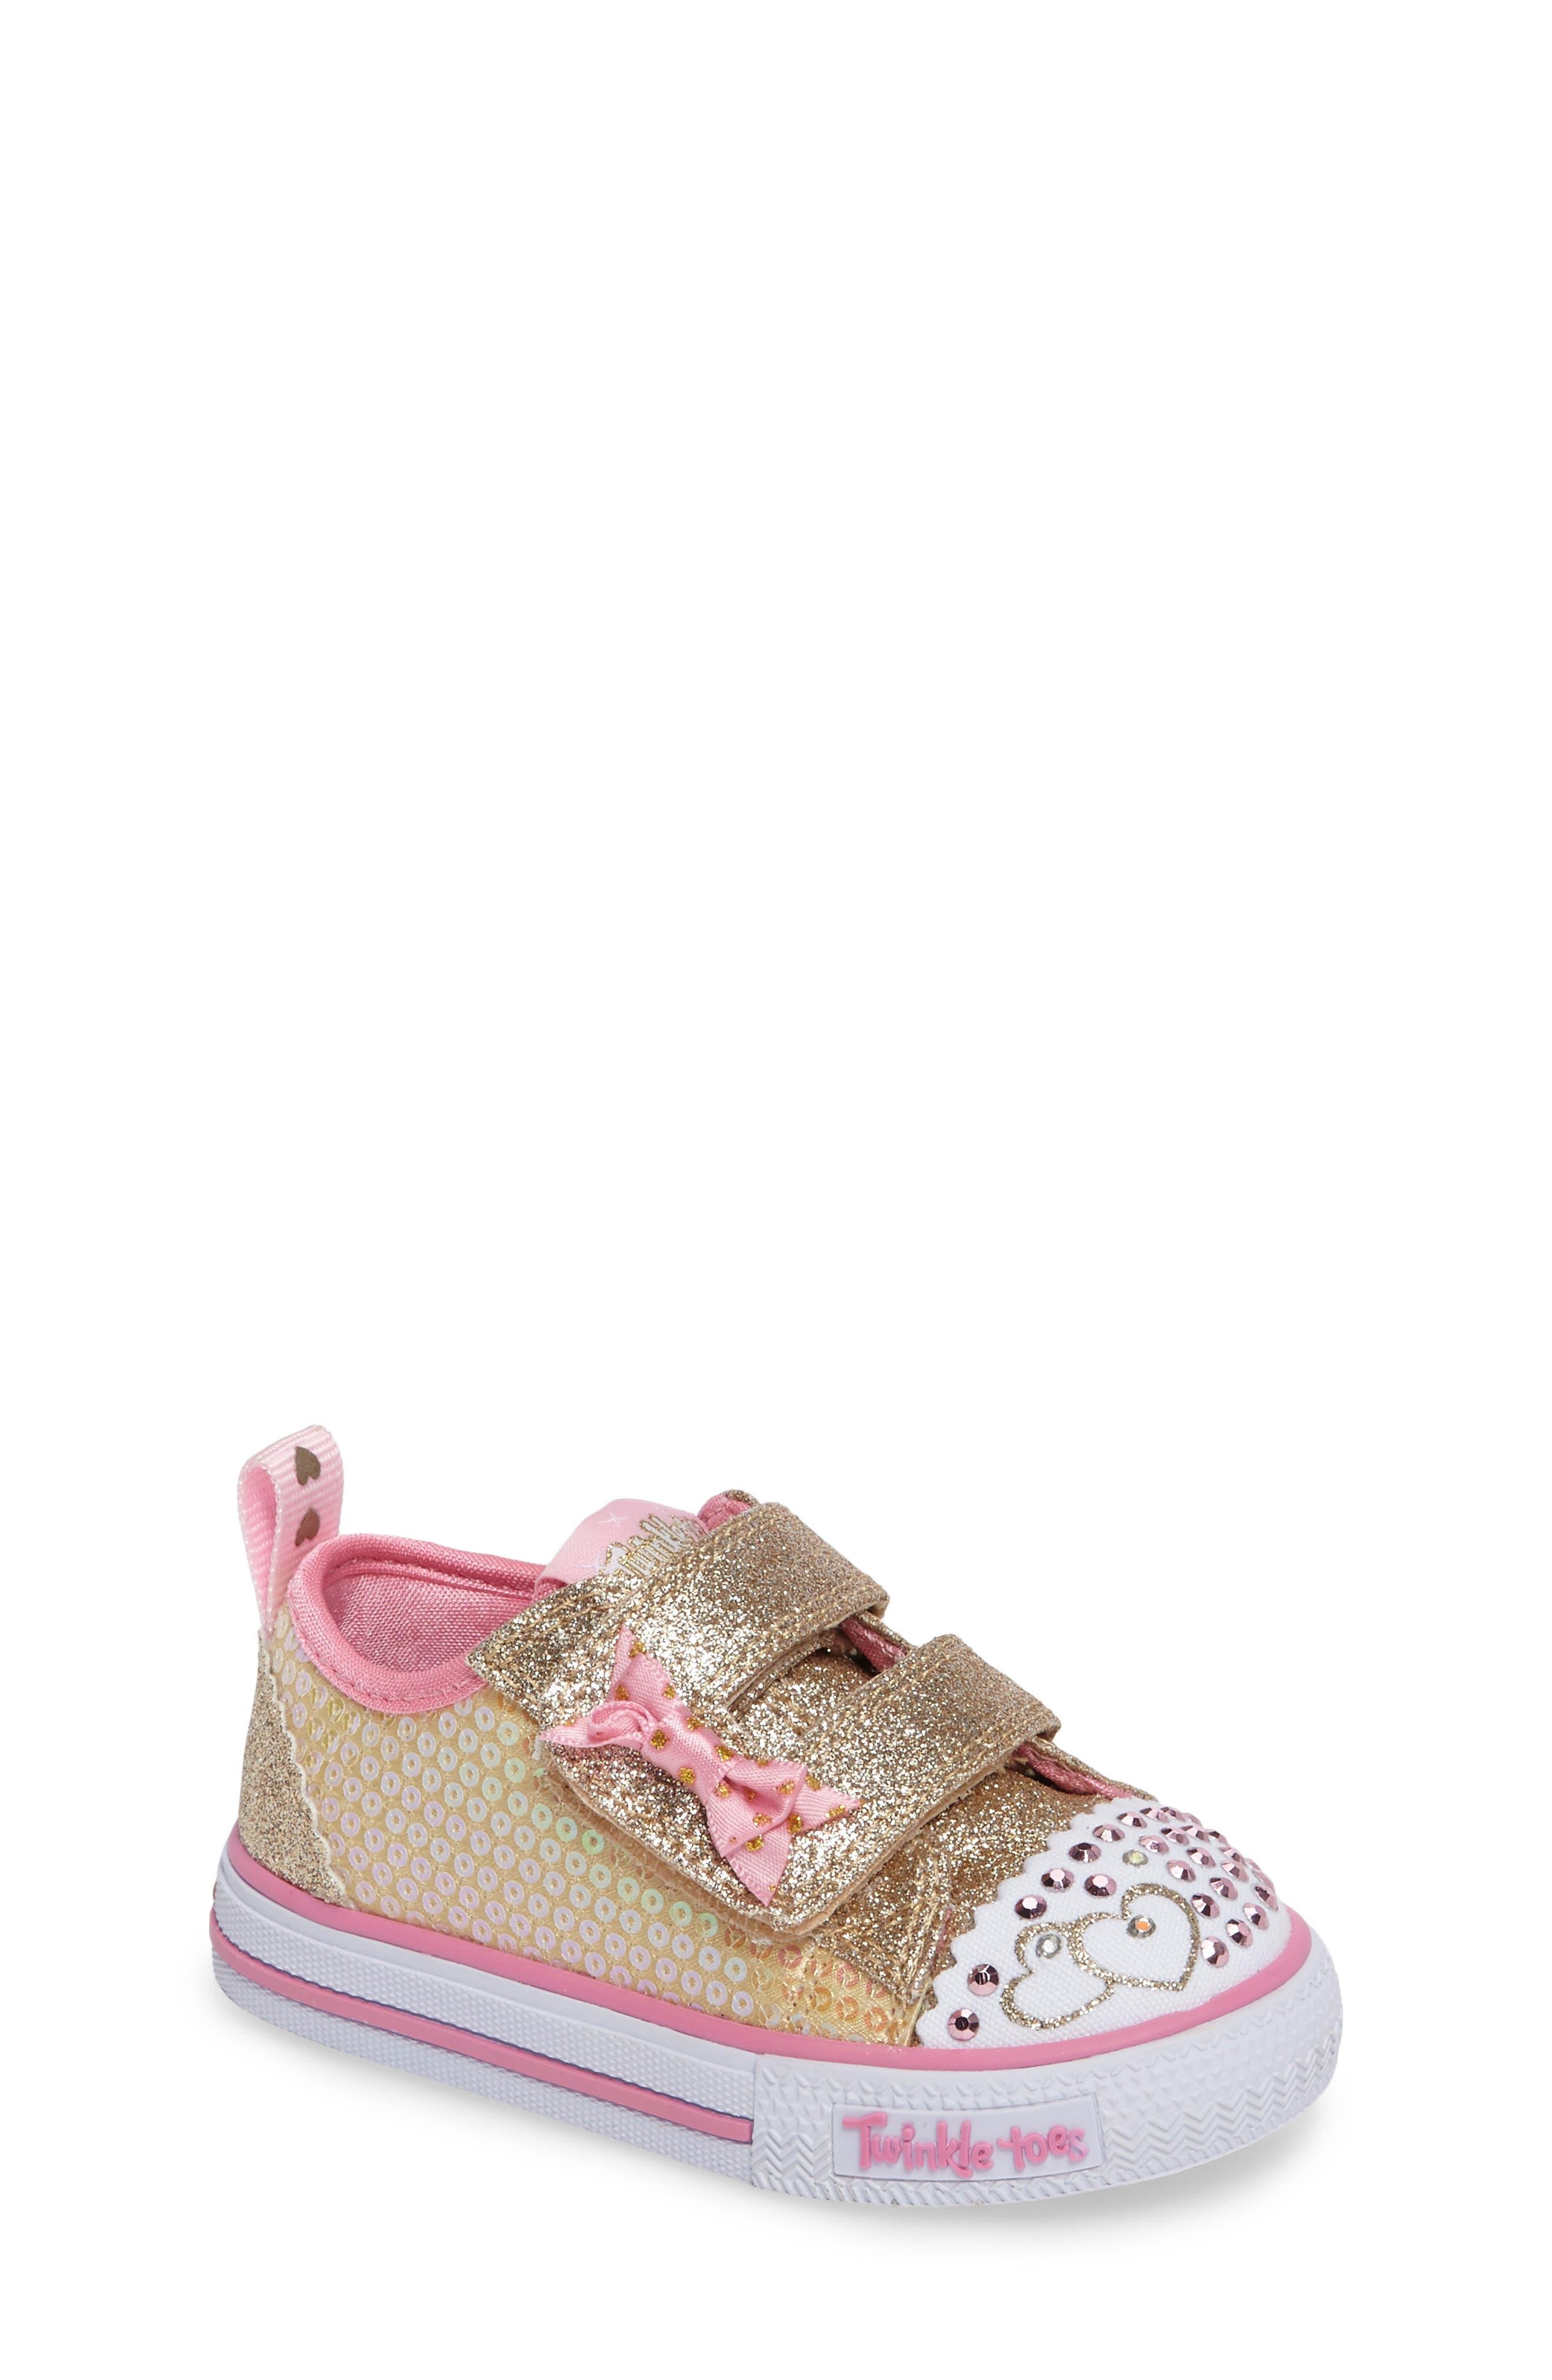 Skechers Shuffles - Itsy Bitsy Sneaker (Walker & Toddler)